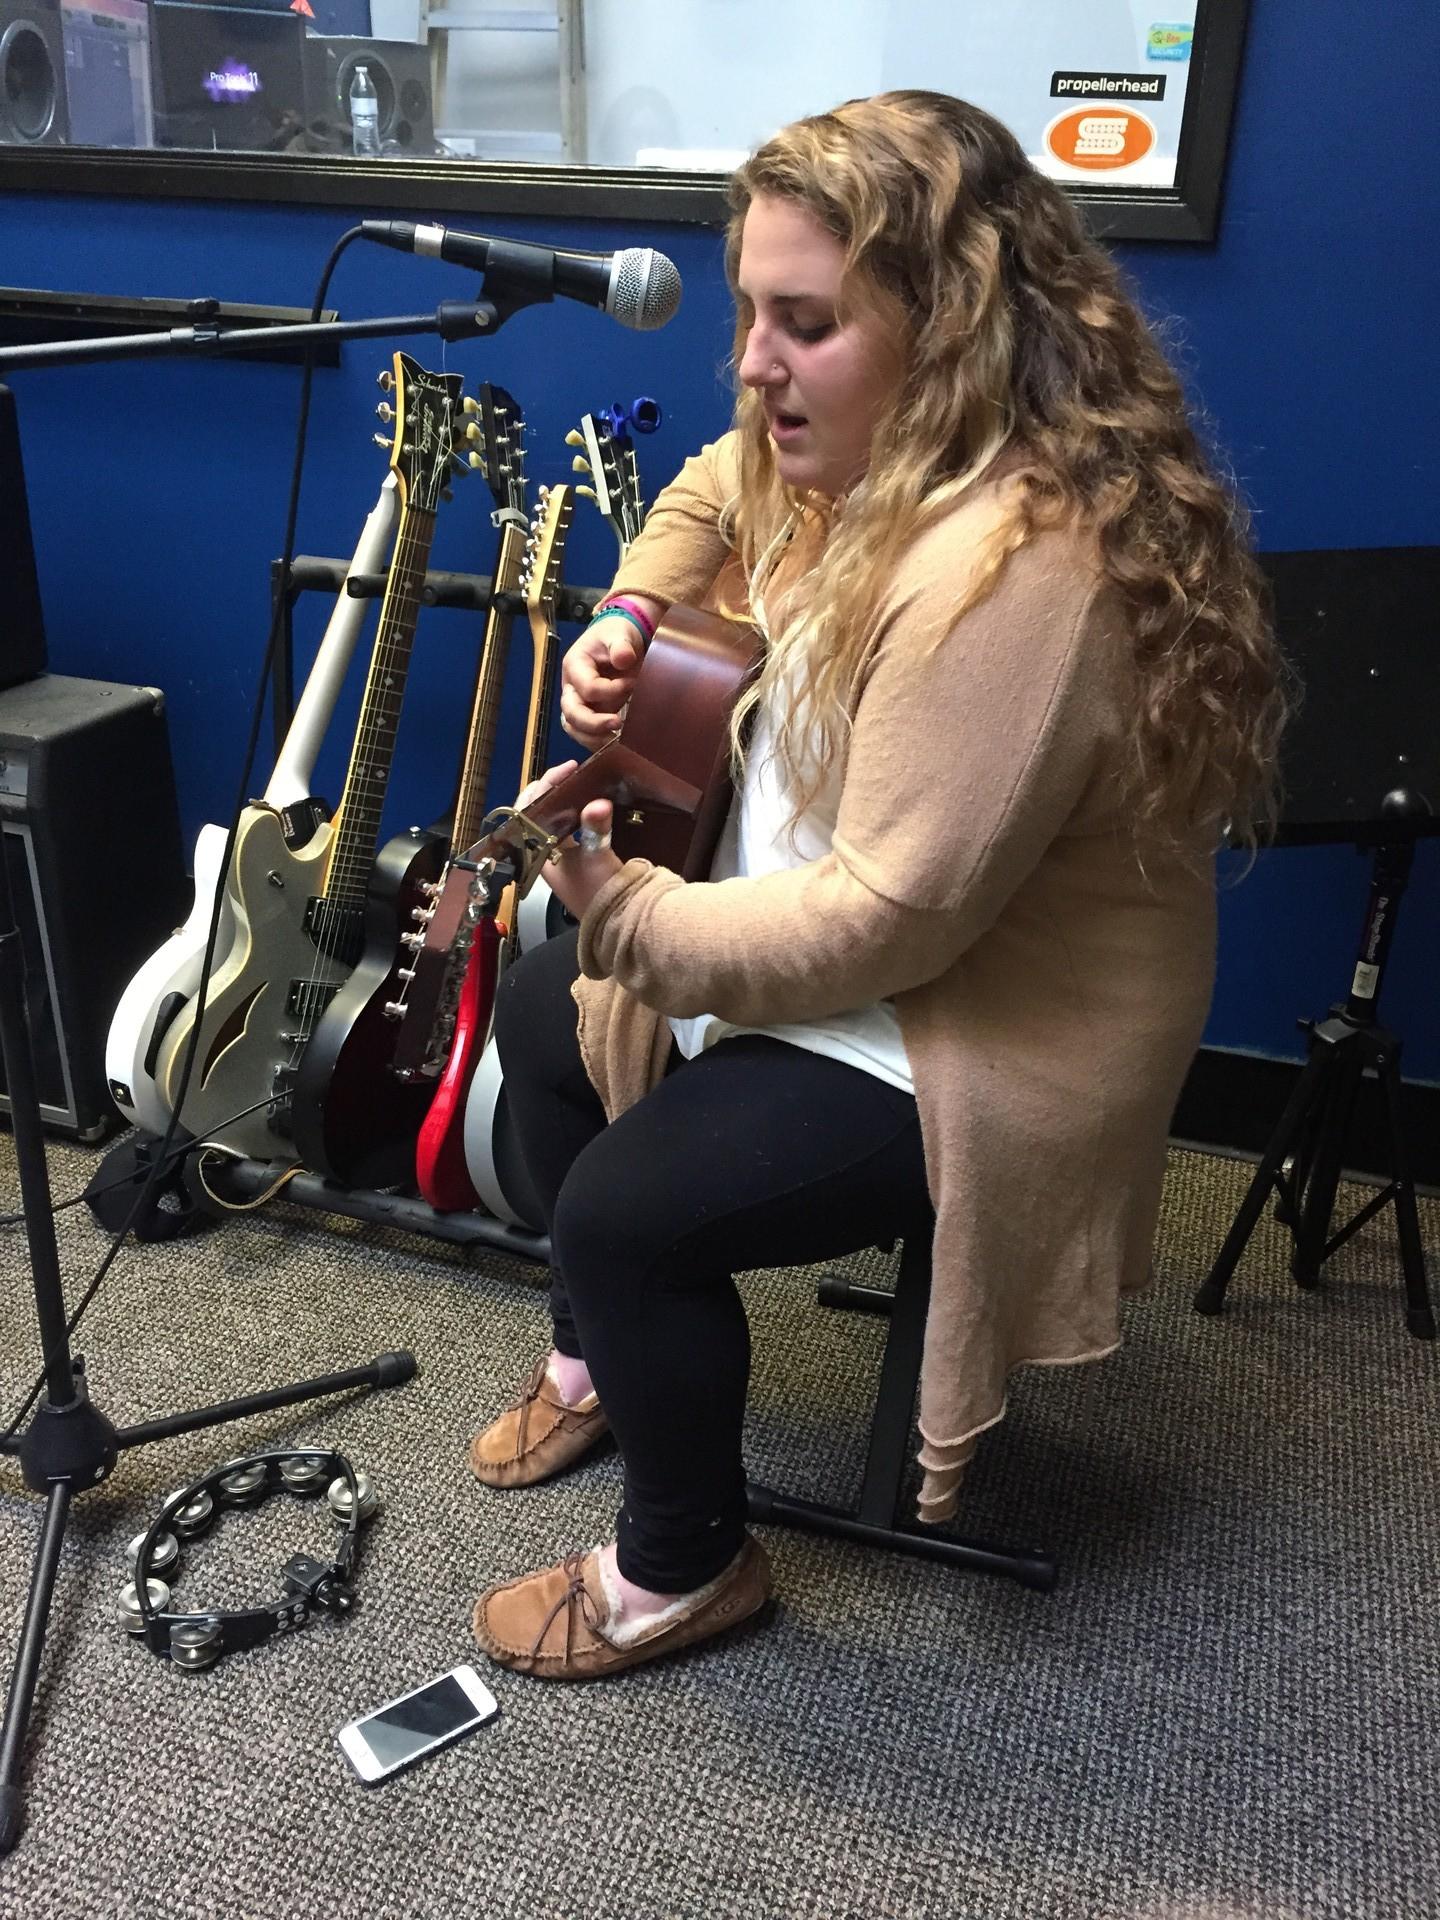 Brandi Rose Lentini plays and sings at Santa Barbara's Eastside Notes for Notes studio.